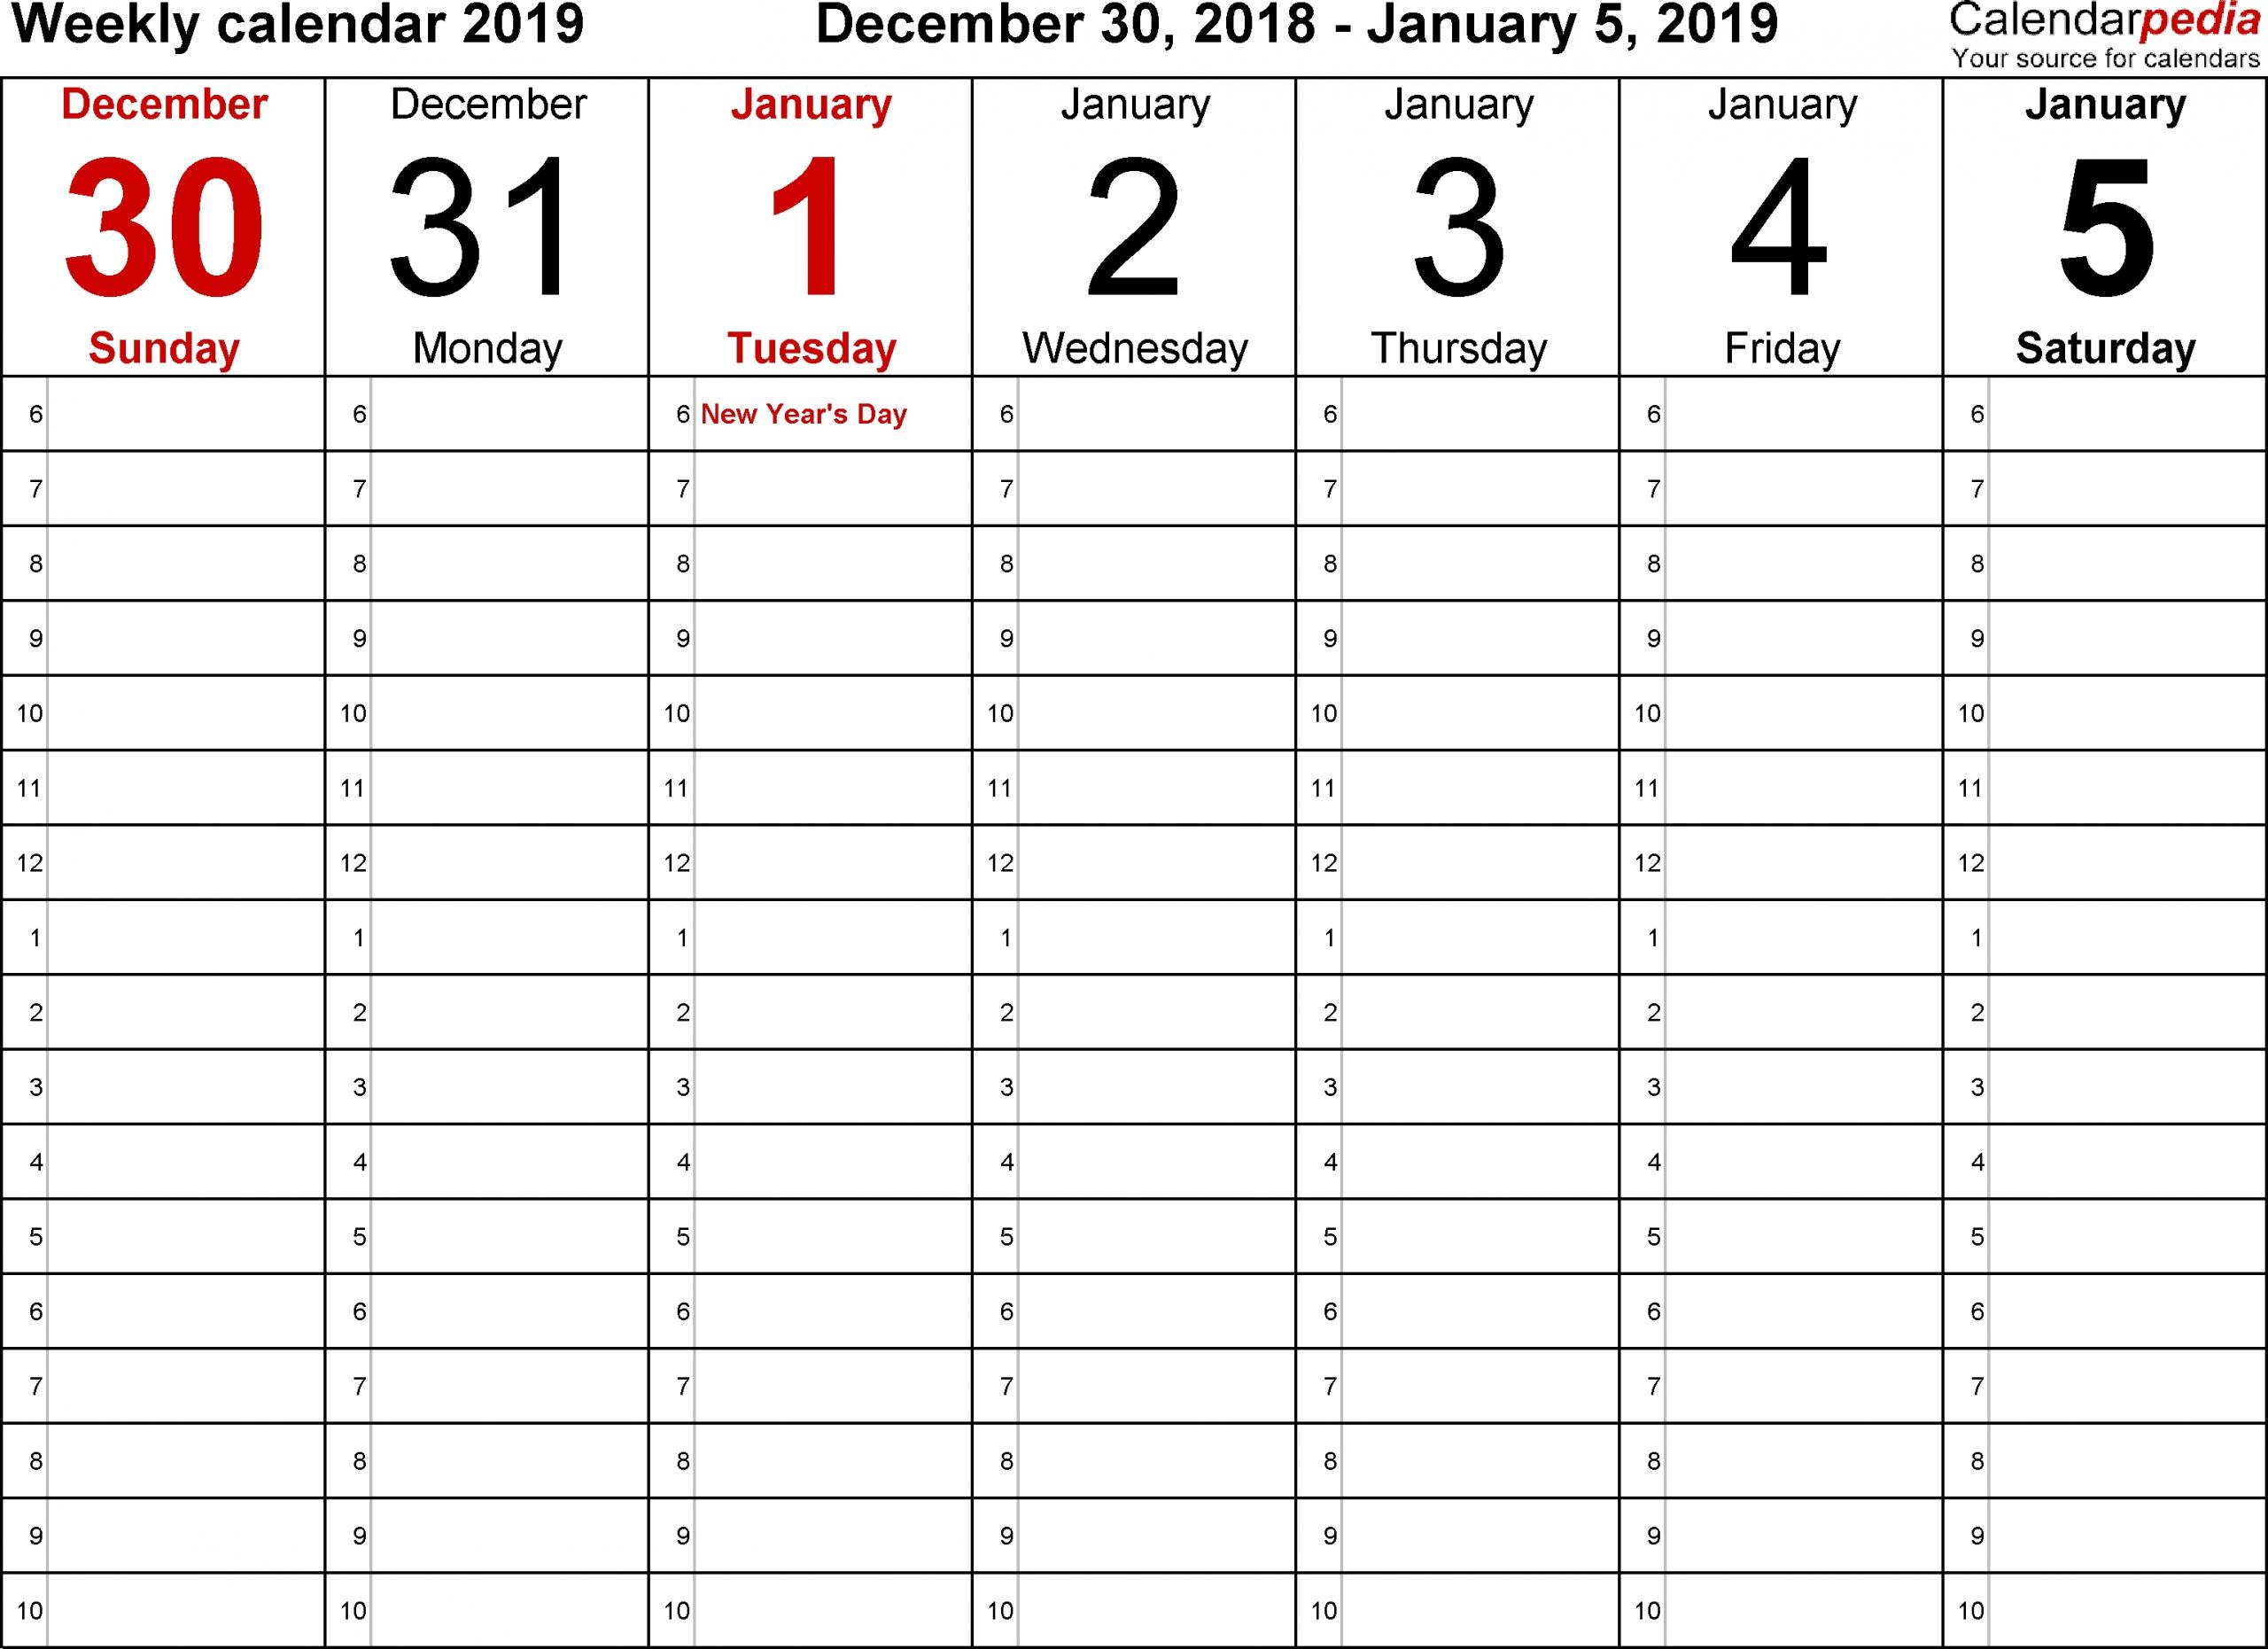 Free Printable 30 Day Calendars - Calendar Inspiration Design 30 Day Calendar Template